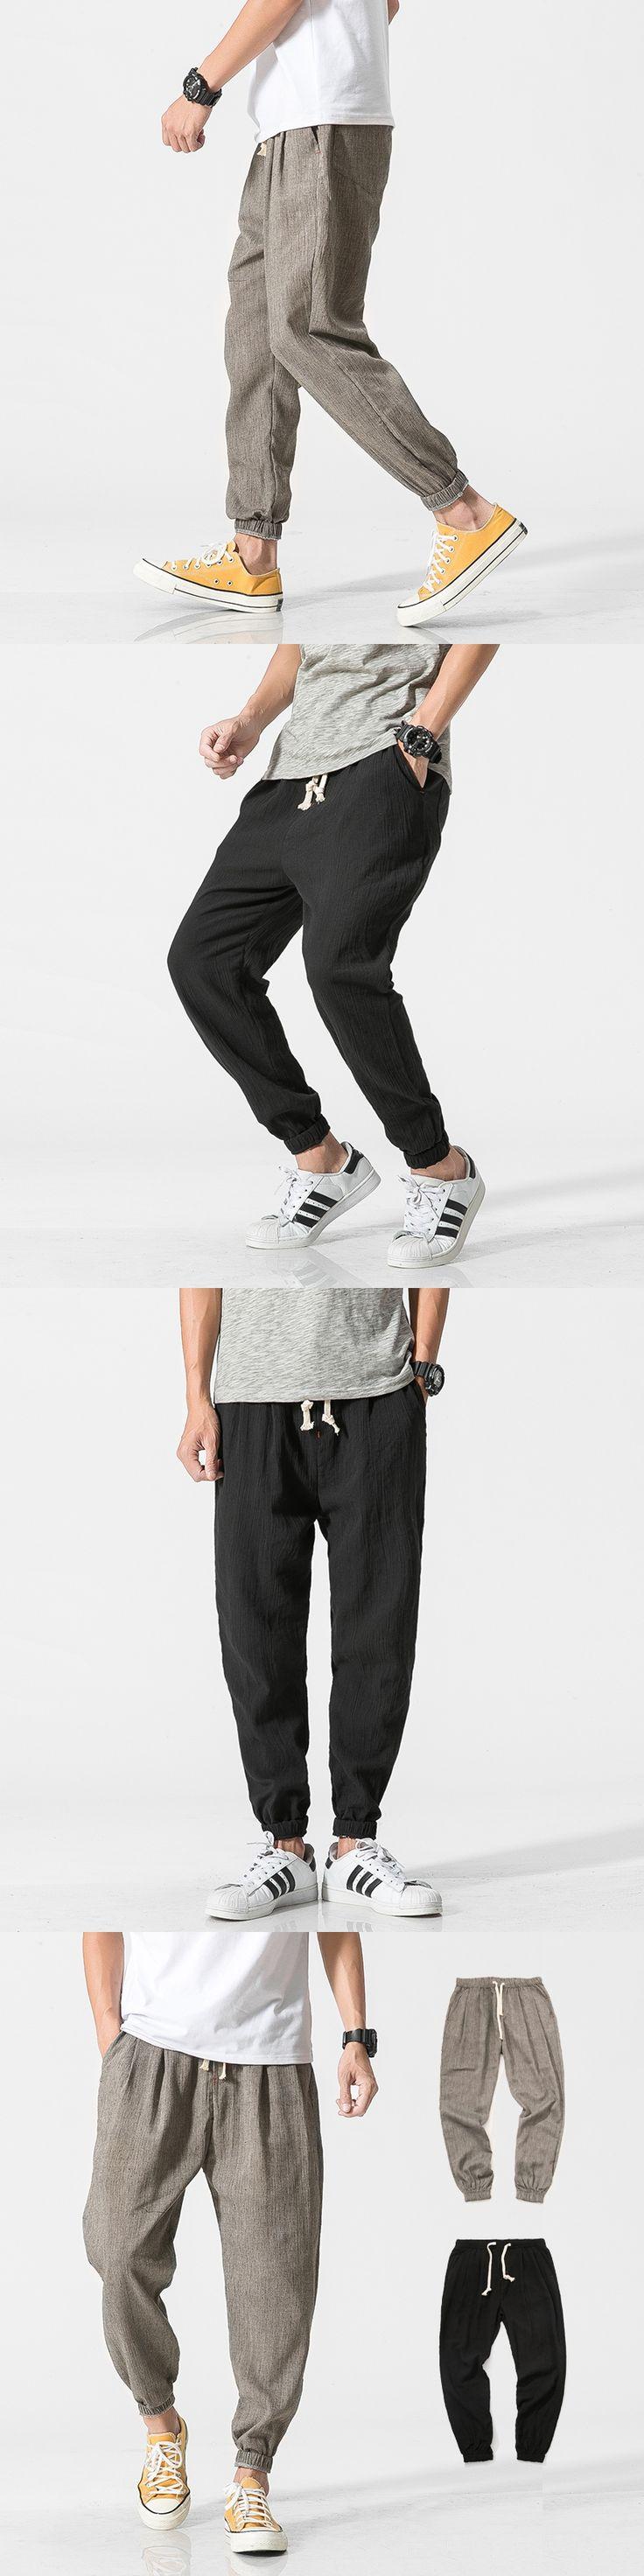 2017 NEW Men linen pants Comfortable Male trousers jogger pants casual straight pants plus size M-5XL black and grey